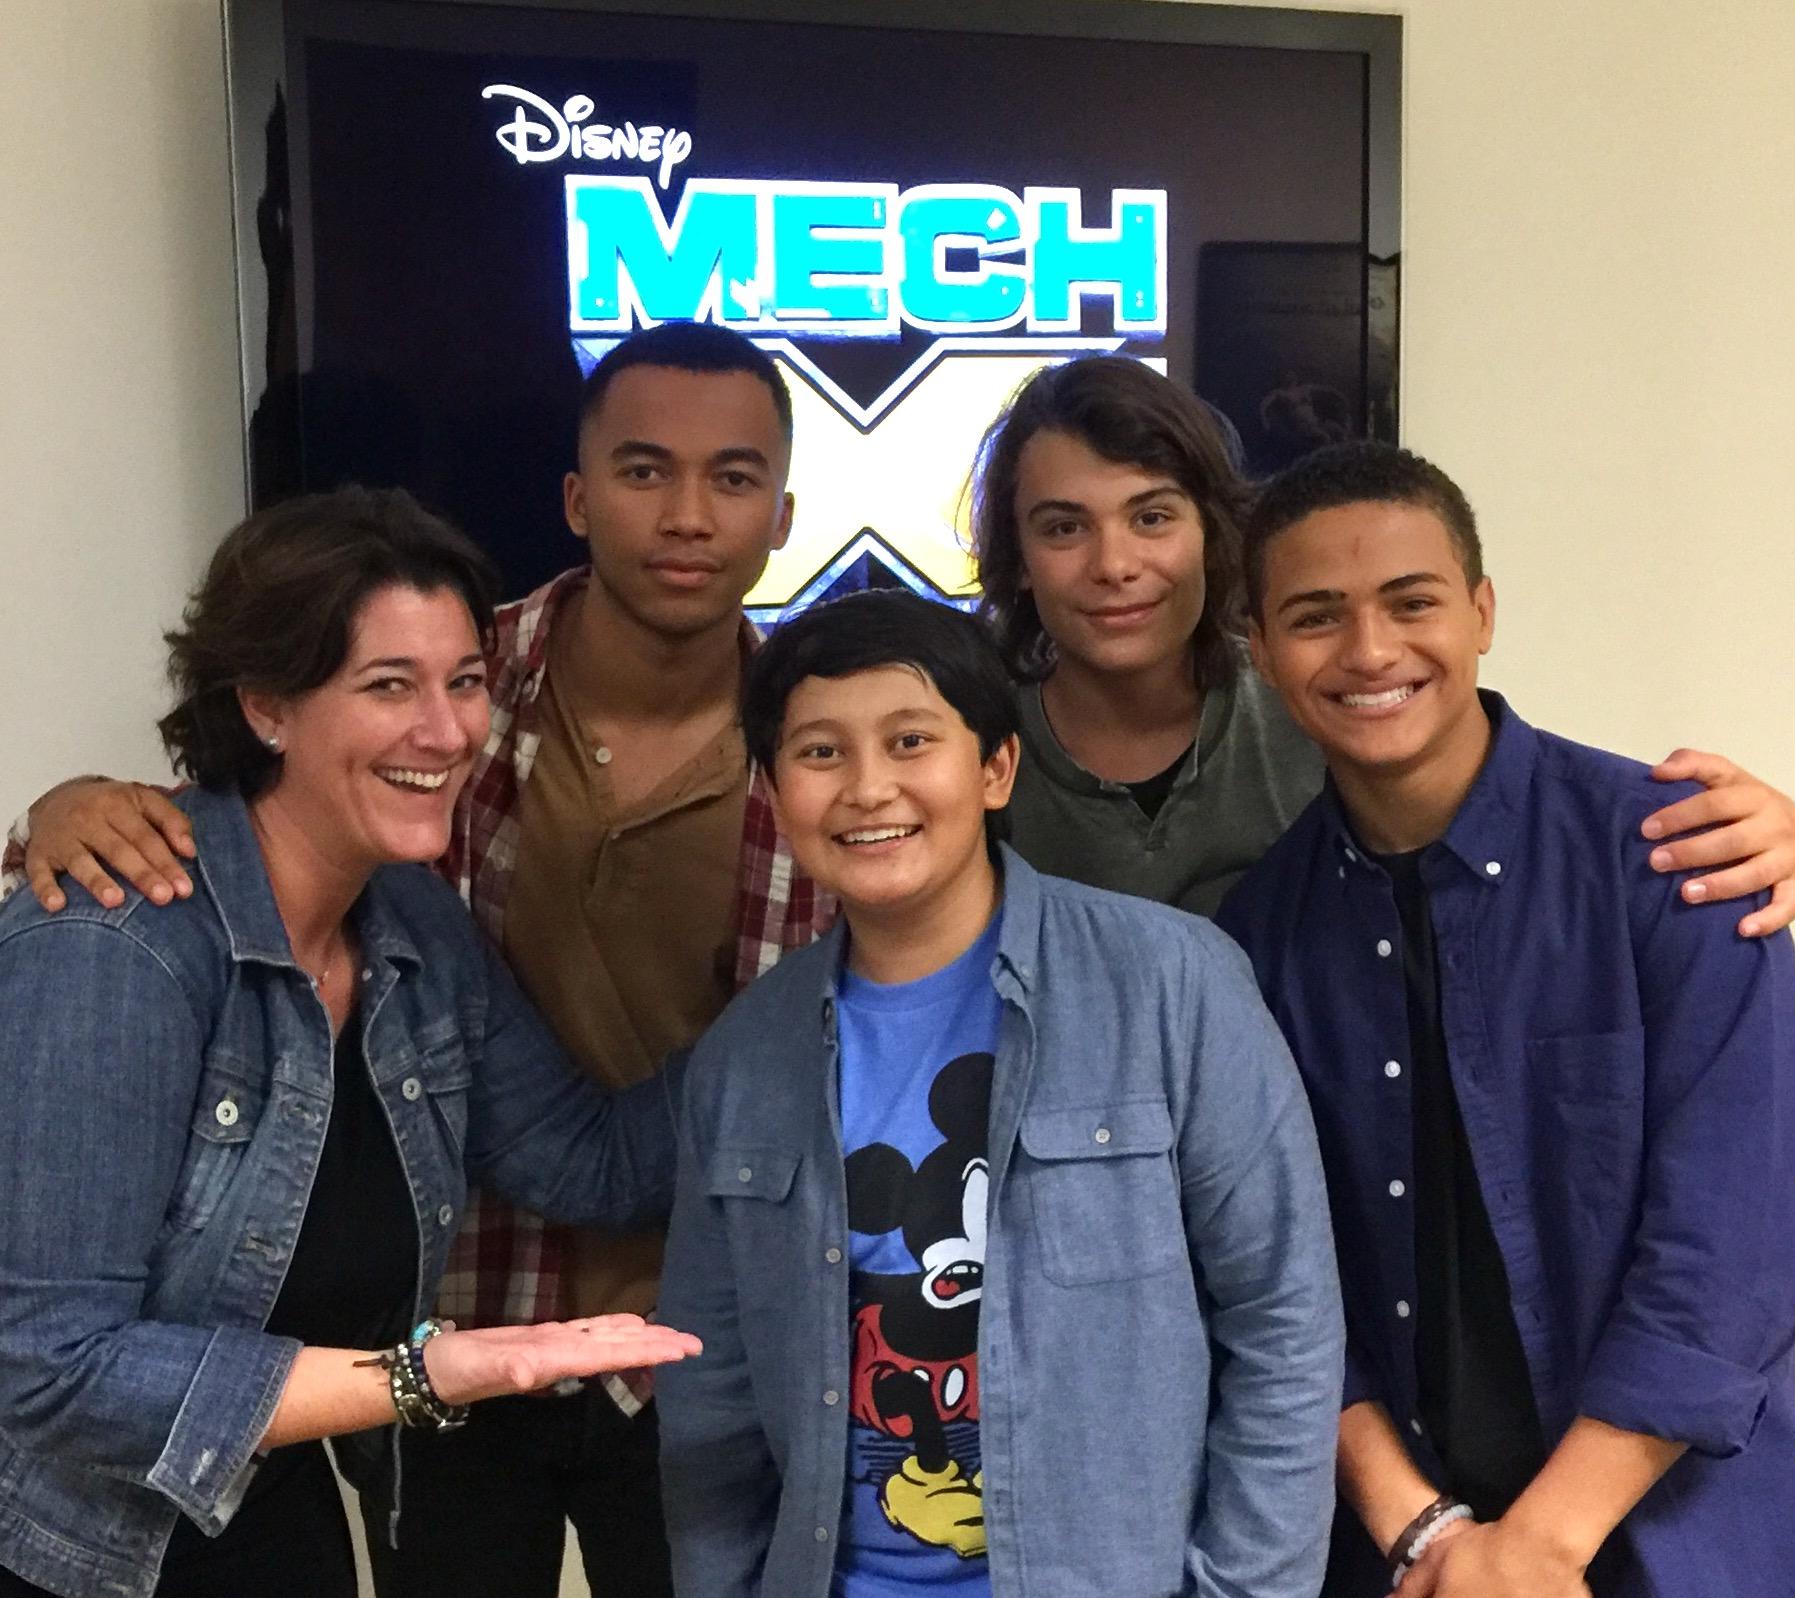 Mech-X4 cast with Trippin' with Tara